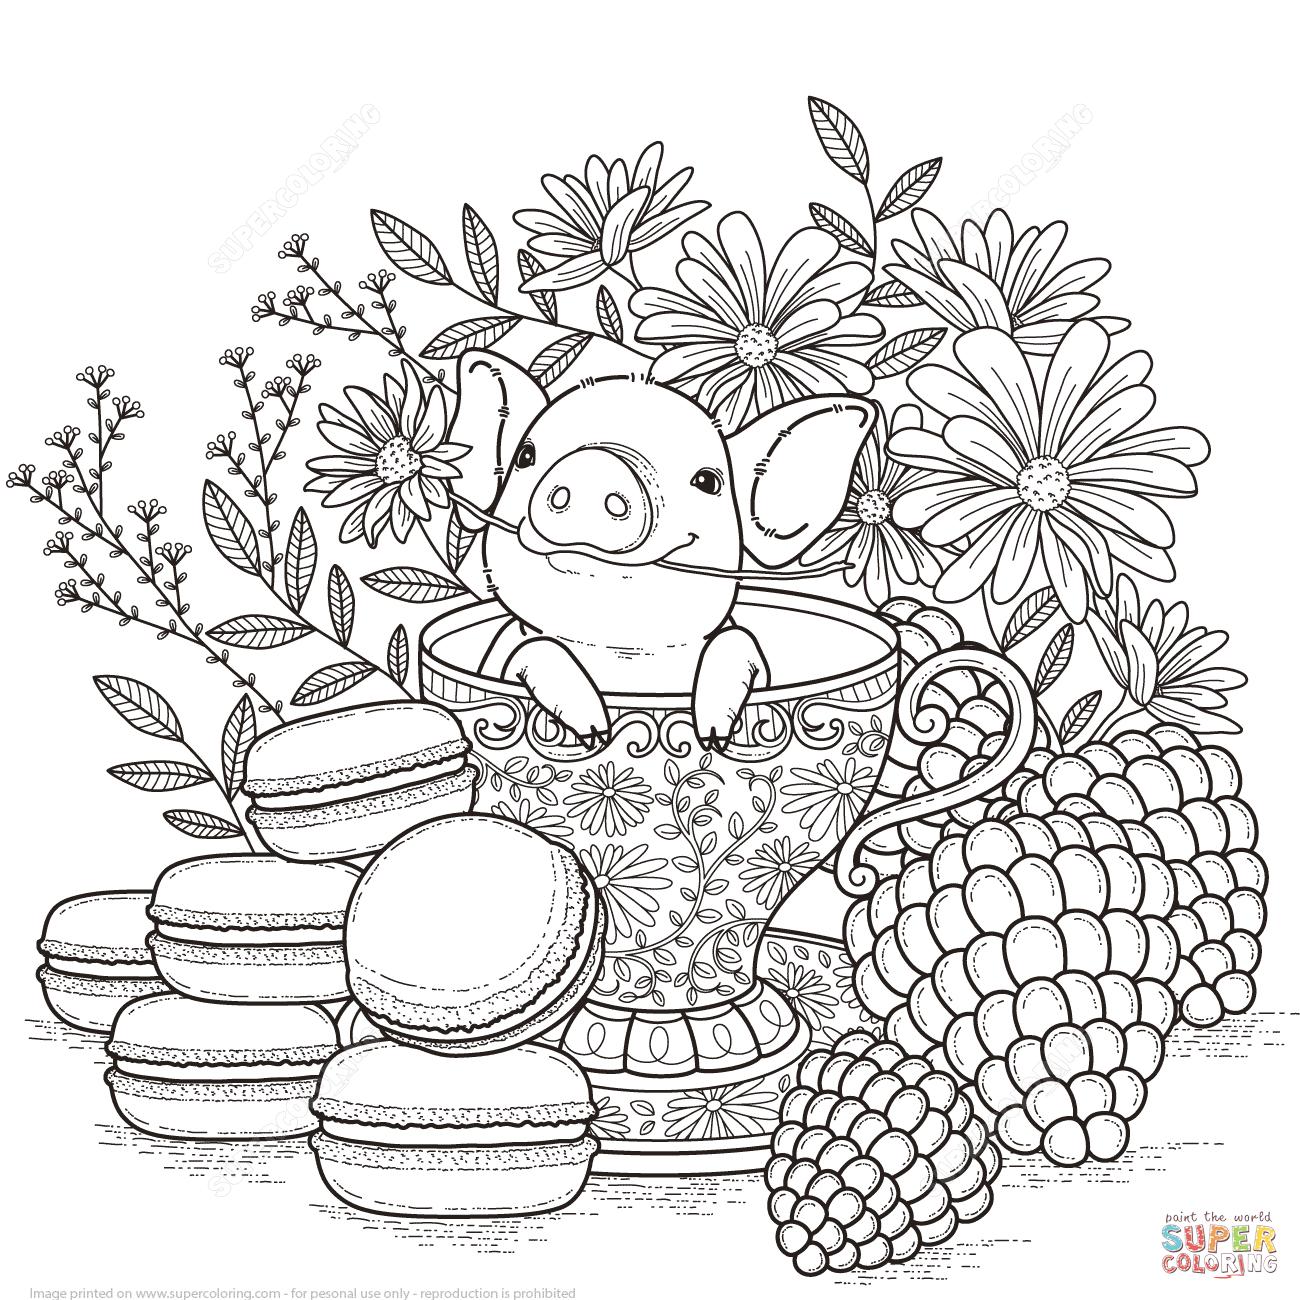 Adorable Little Pig Coloring Page Png 1300 1300 Coloracao Adulta Imagens Para Colorir Desenhos Para Colorir Adultos